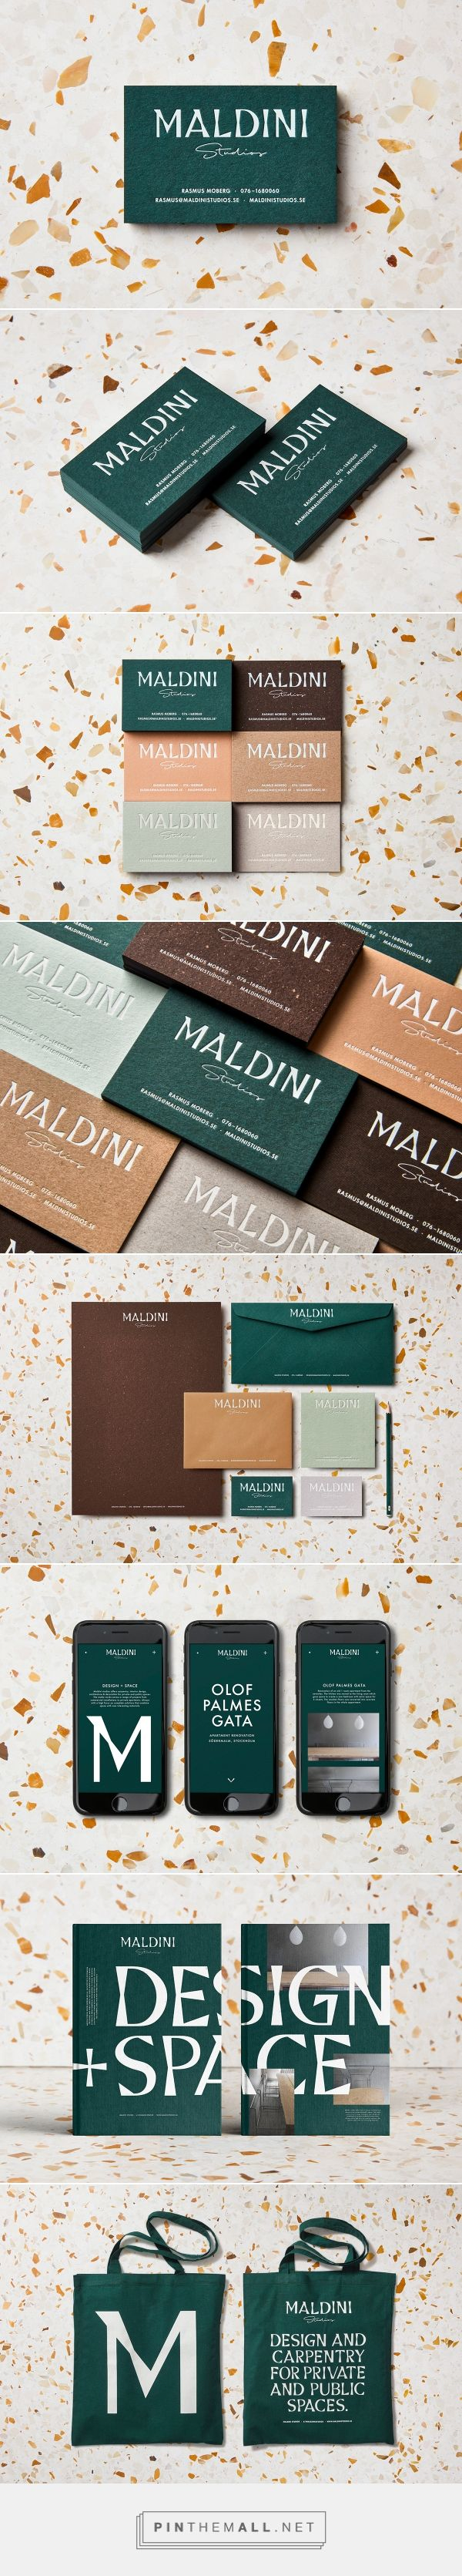 Maldini Studios on Behance - created via https://pinthemall.net